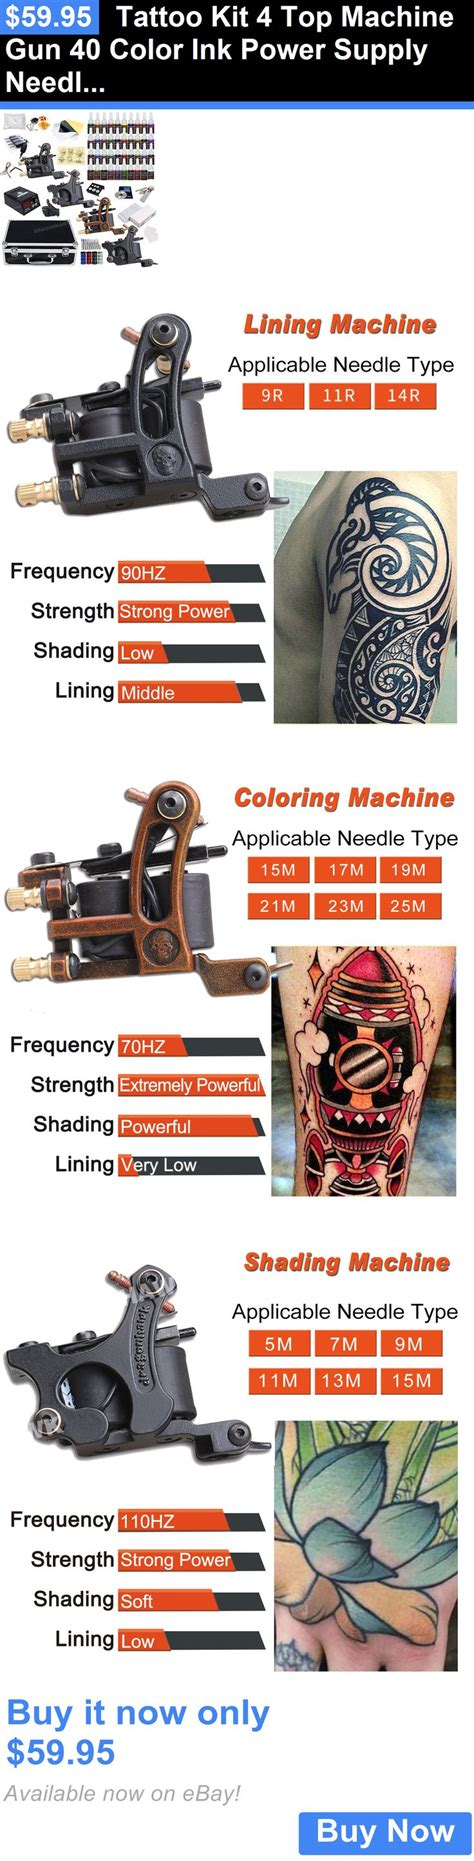 tattoo kits ebay 100 complete kits ebay complete kits